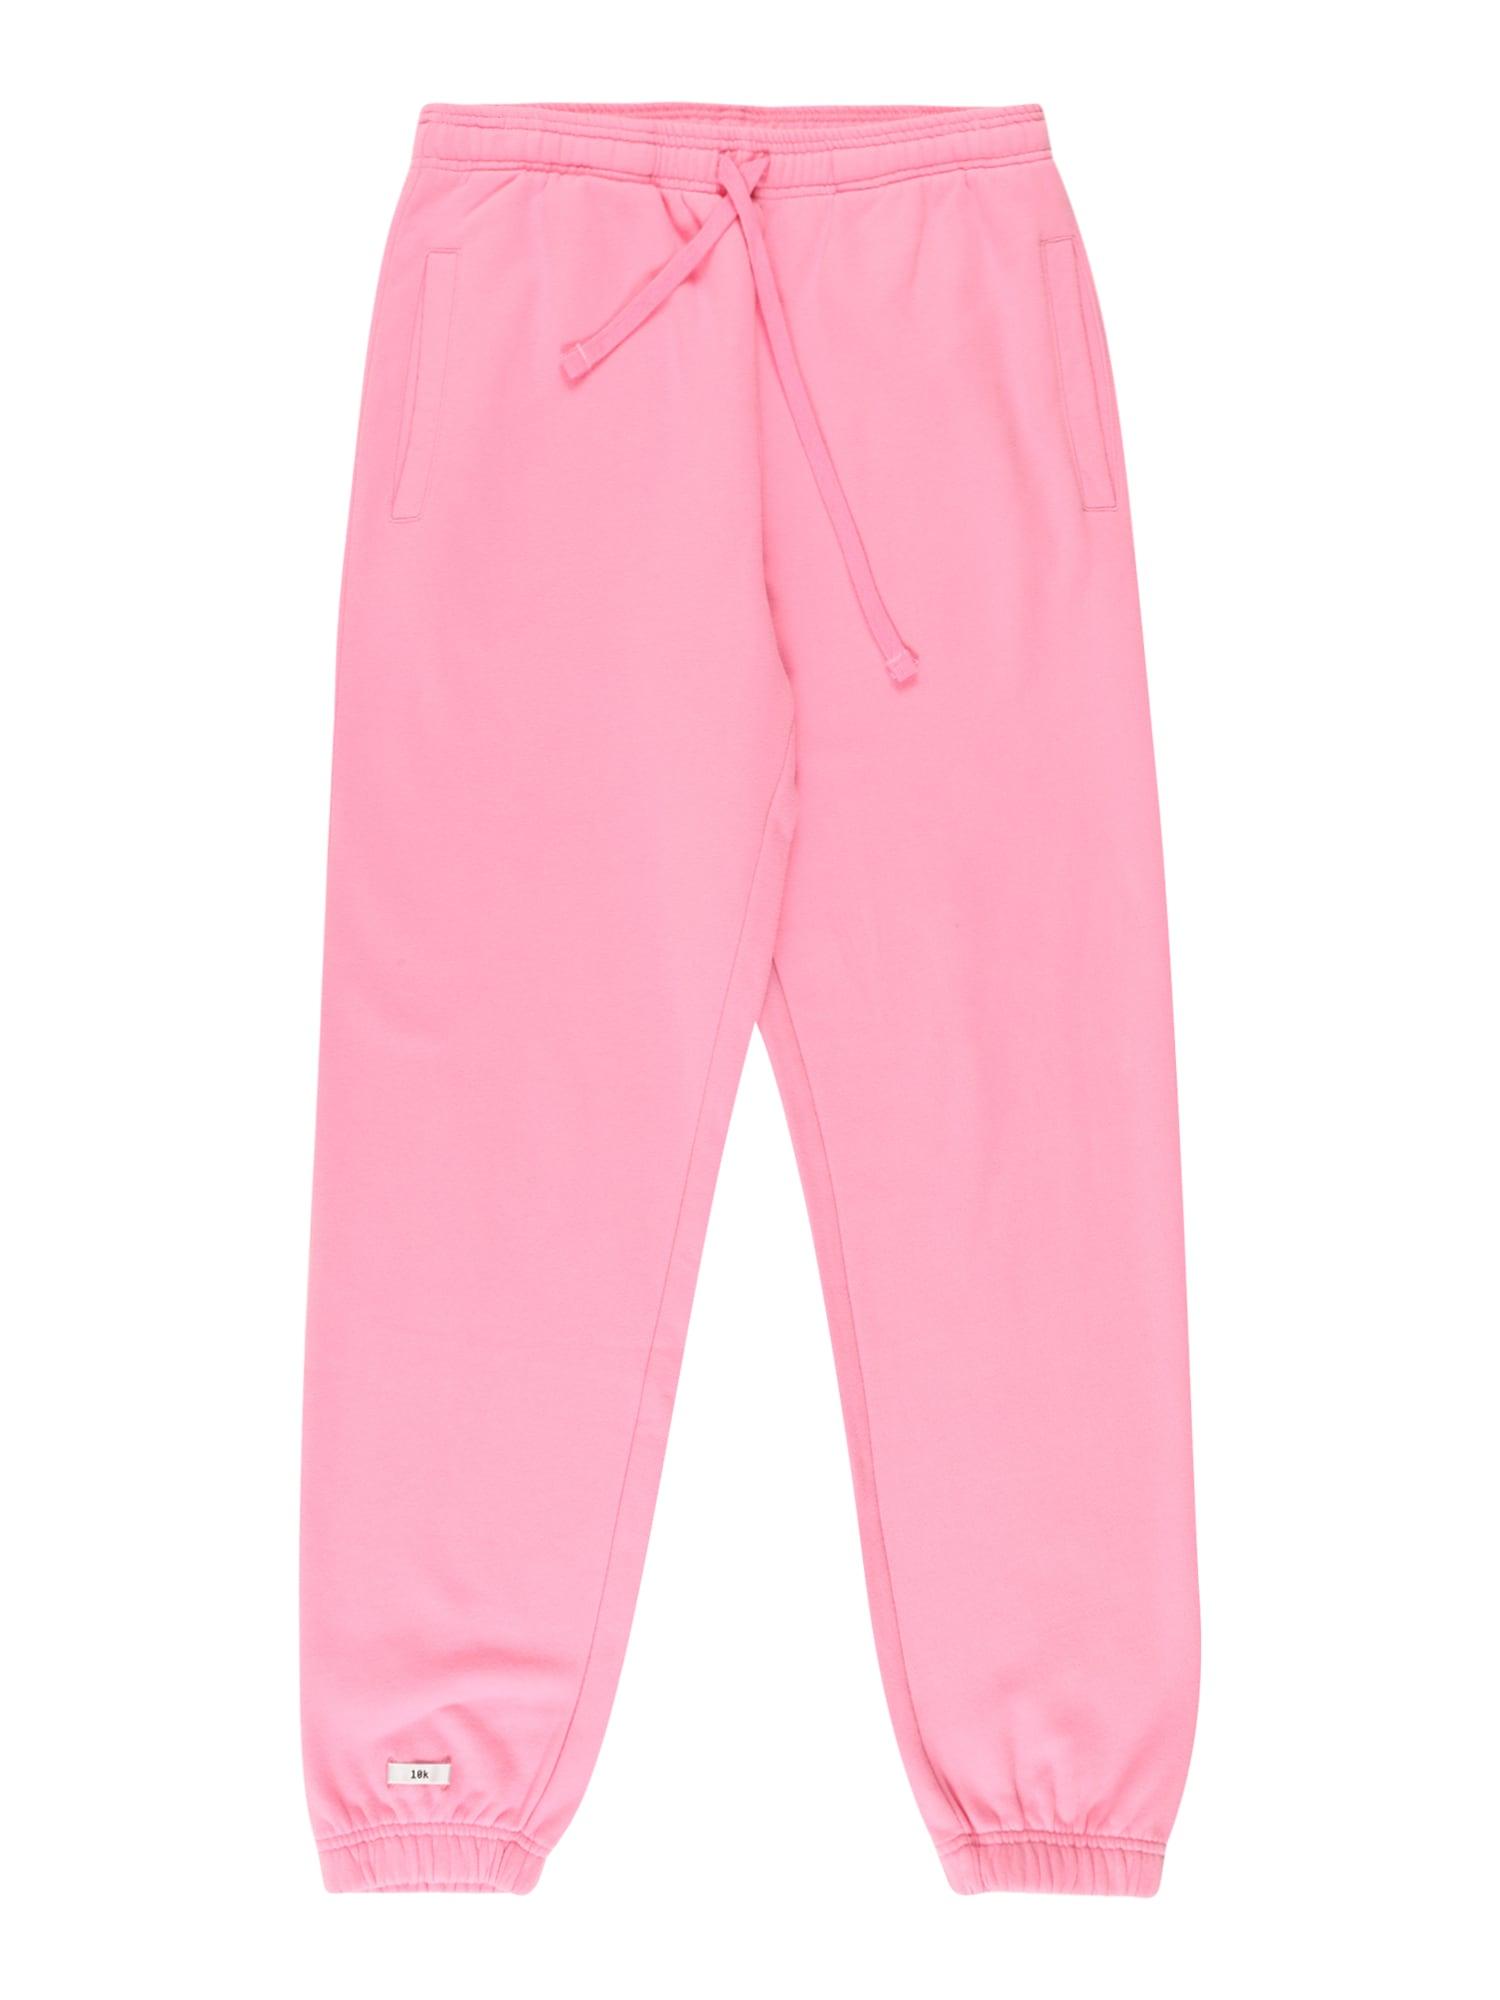 10k Pantalon  - Rose - Taille: S - male